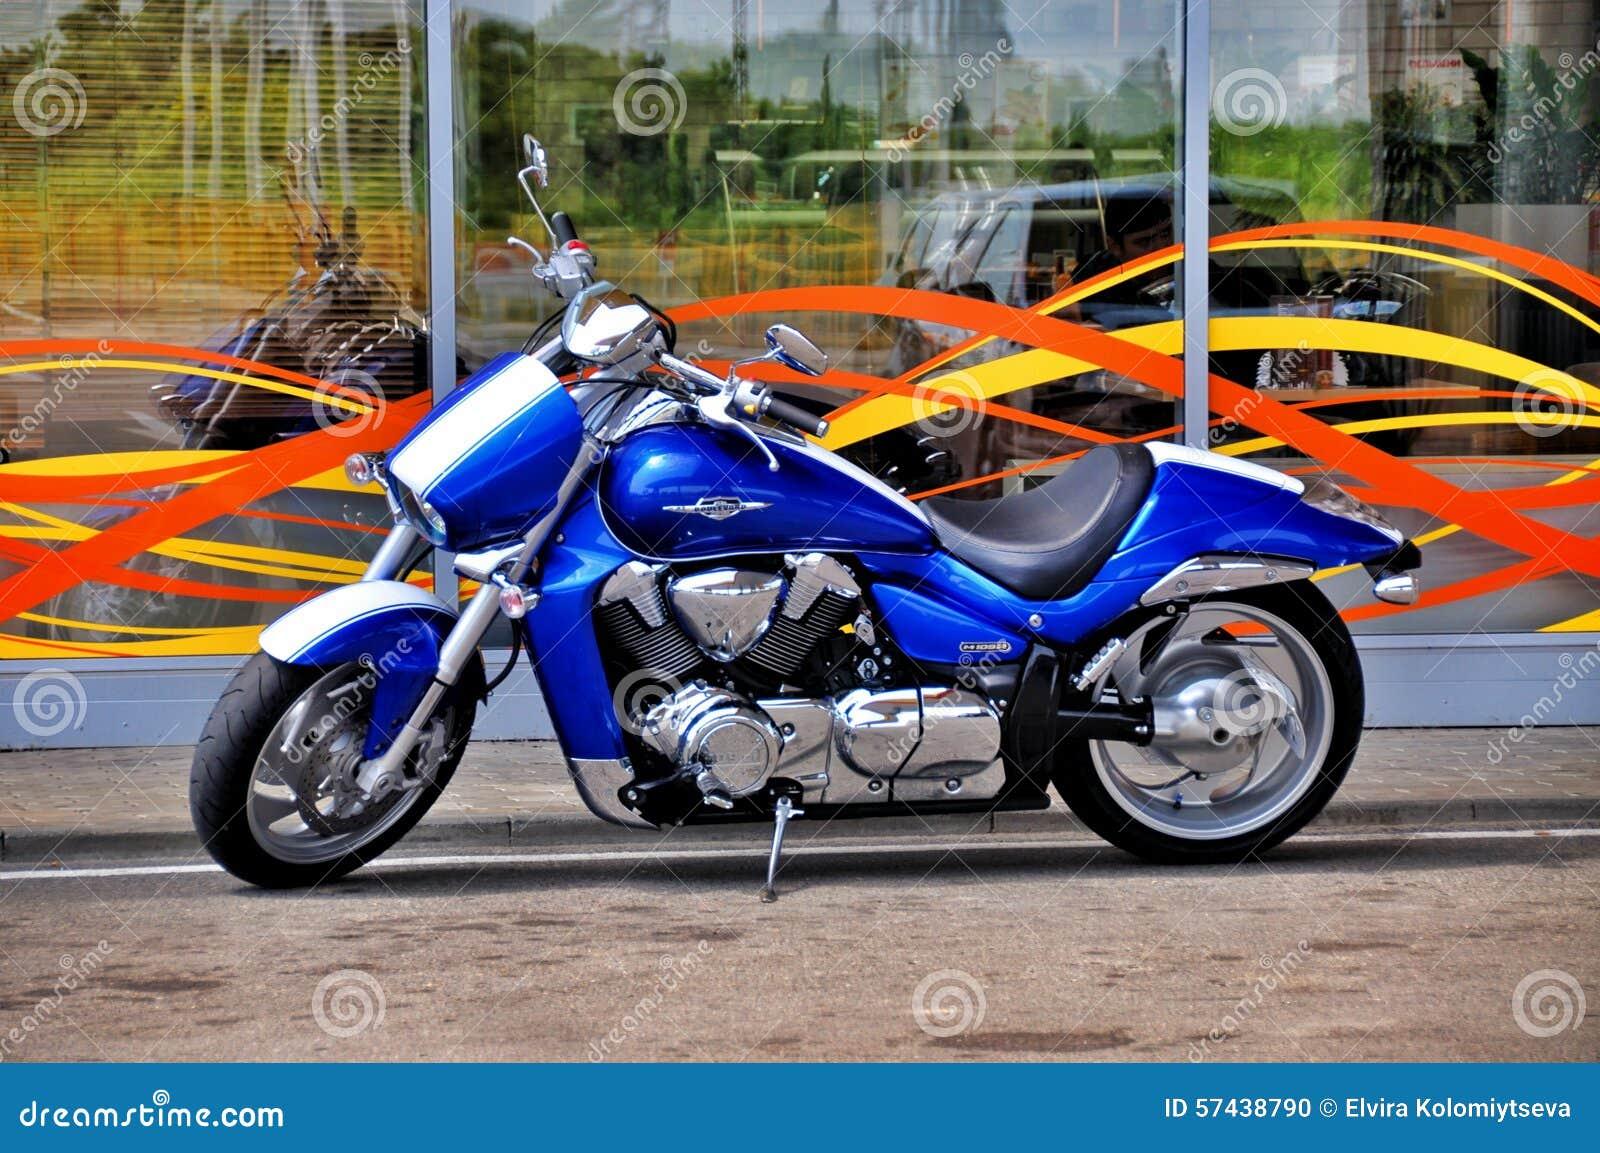 Motorcycle Road Bike Cruiser Editorial Image Image